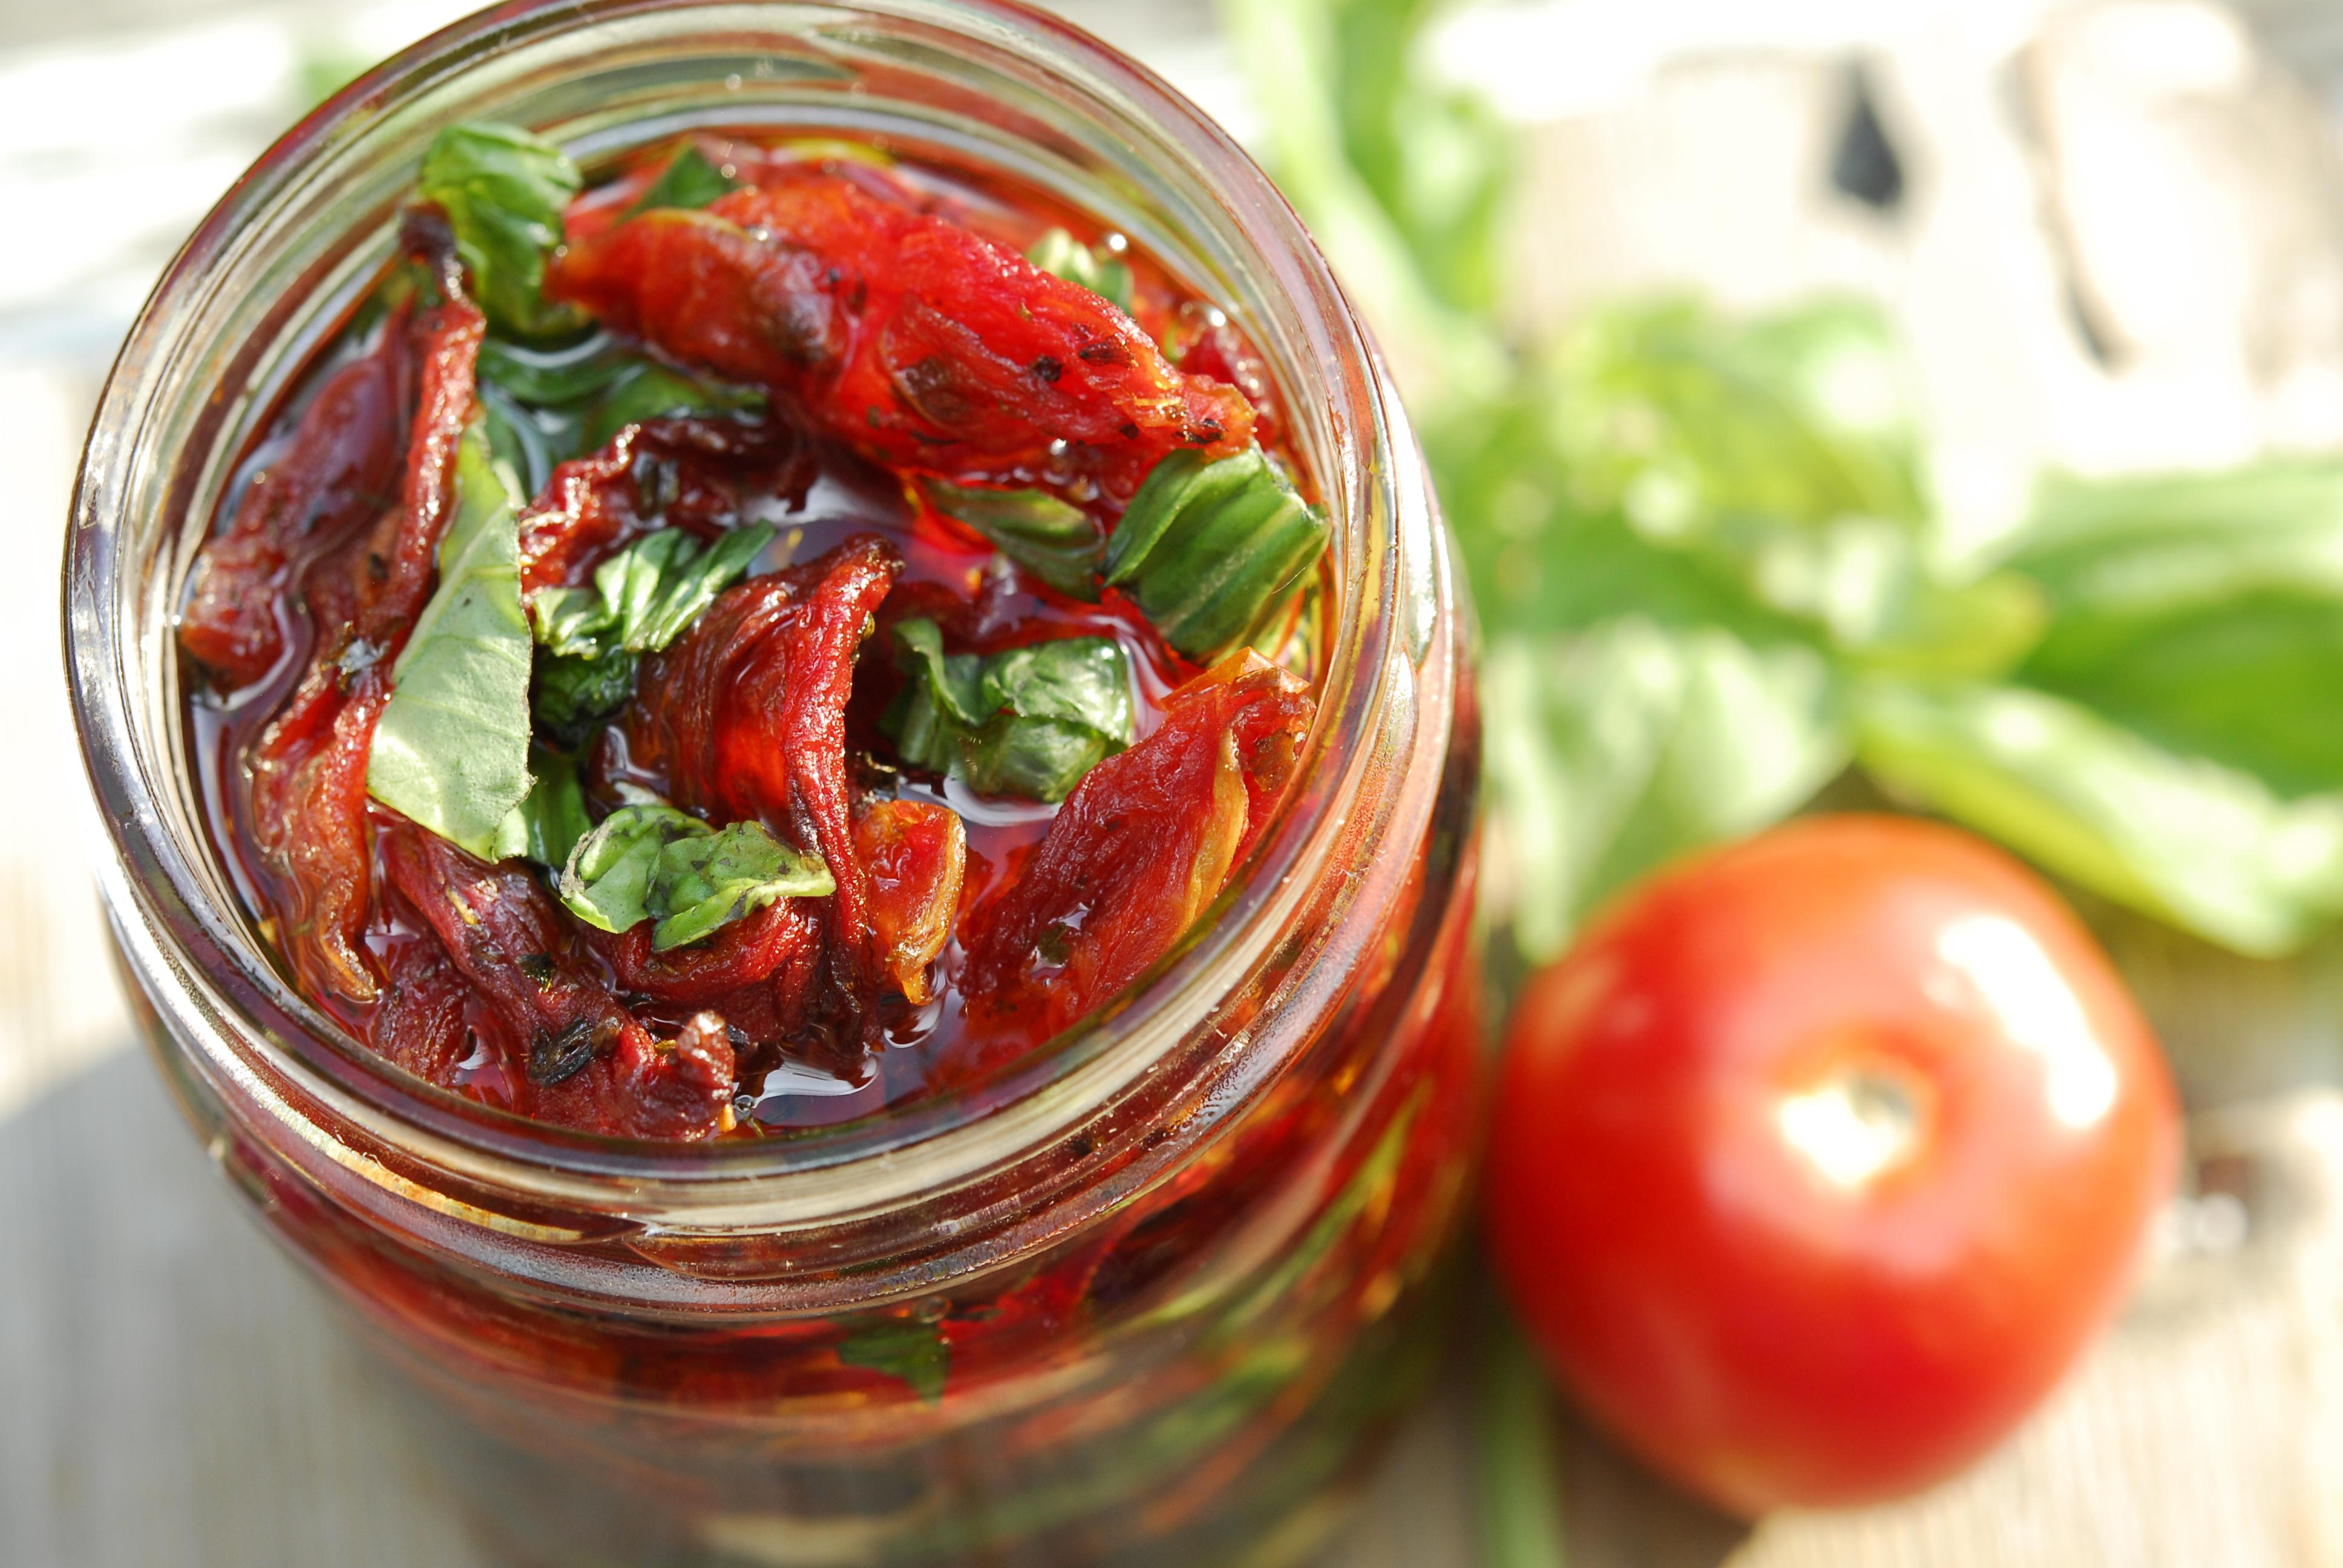 vjalenye pomidory